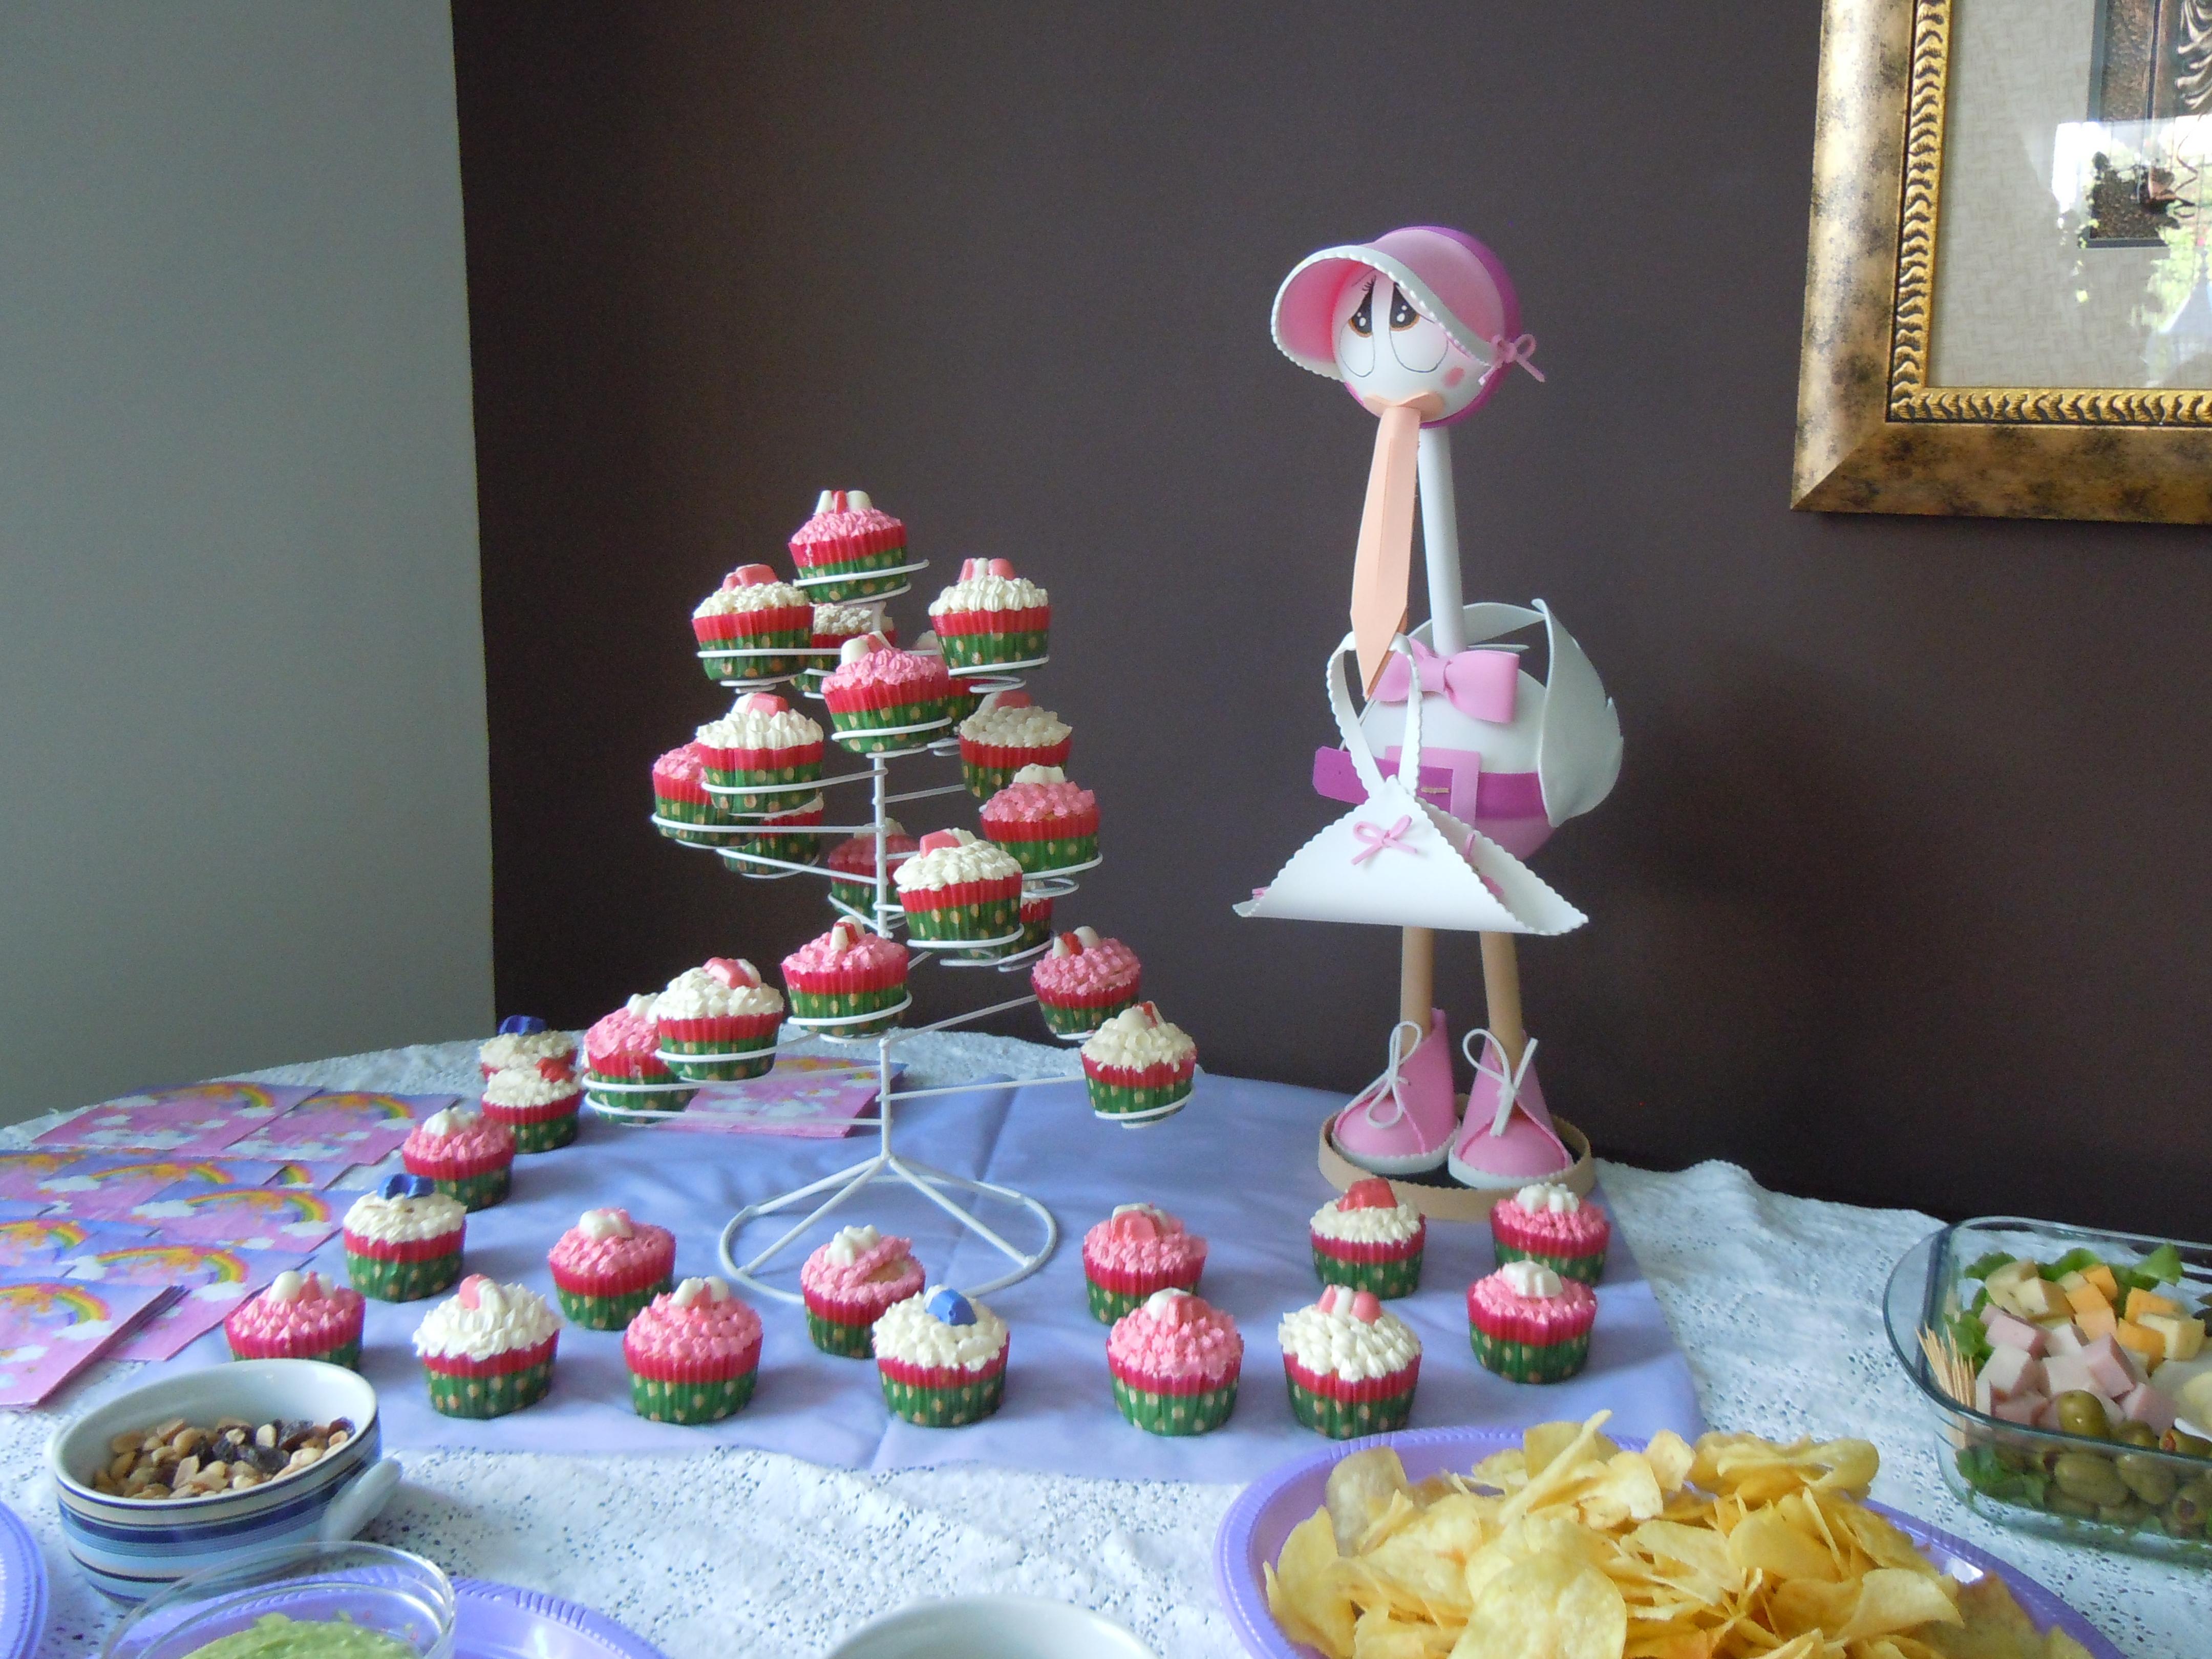 babyshower decoration, cupcakes, cakes amsterdam